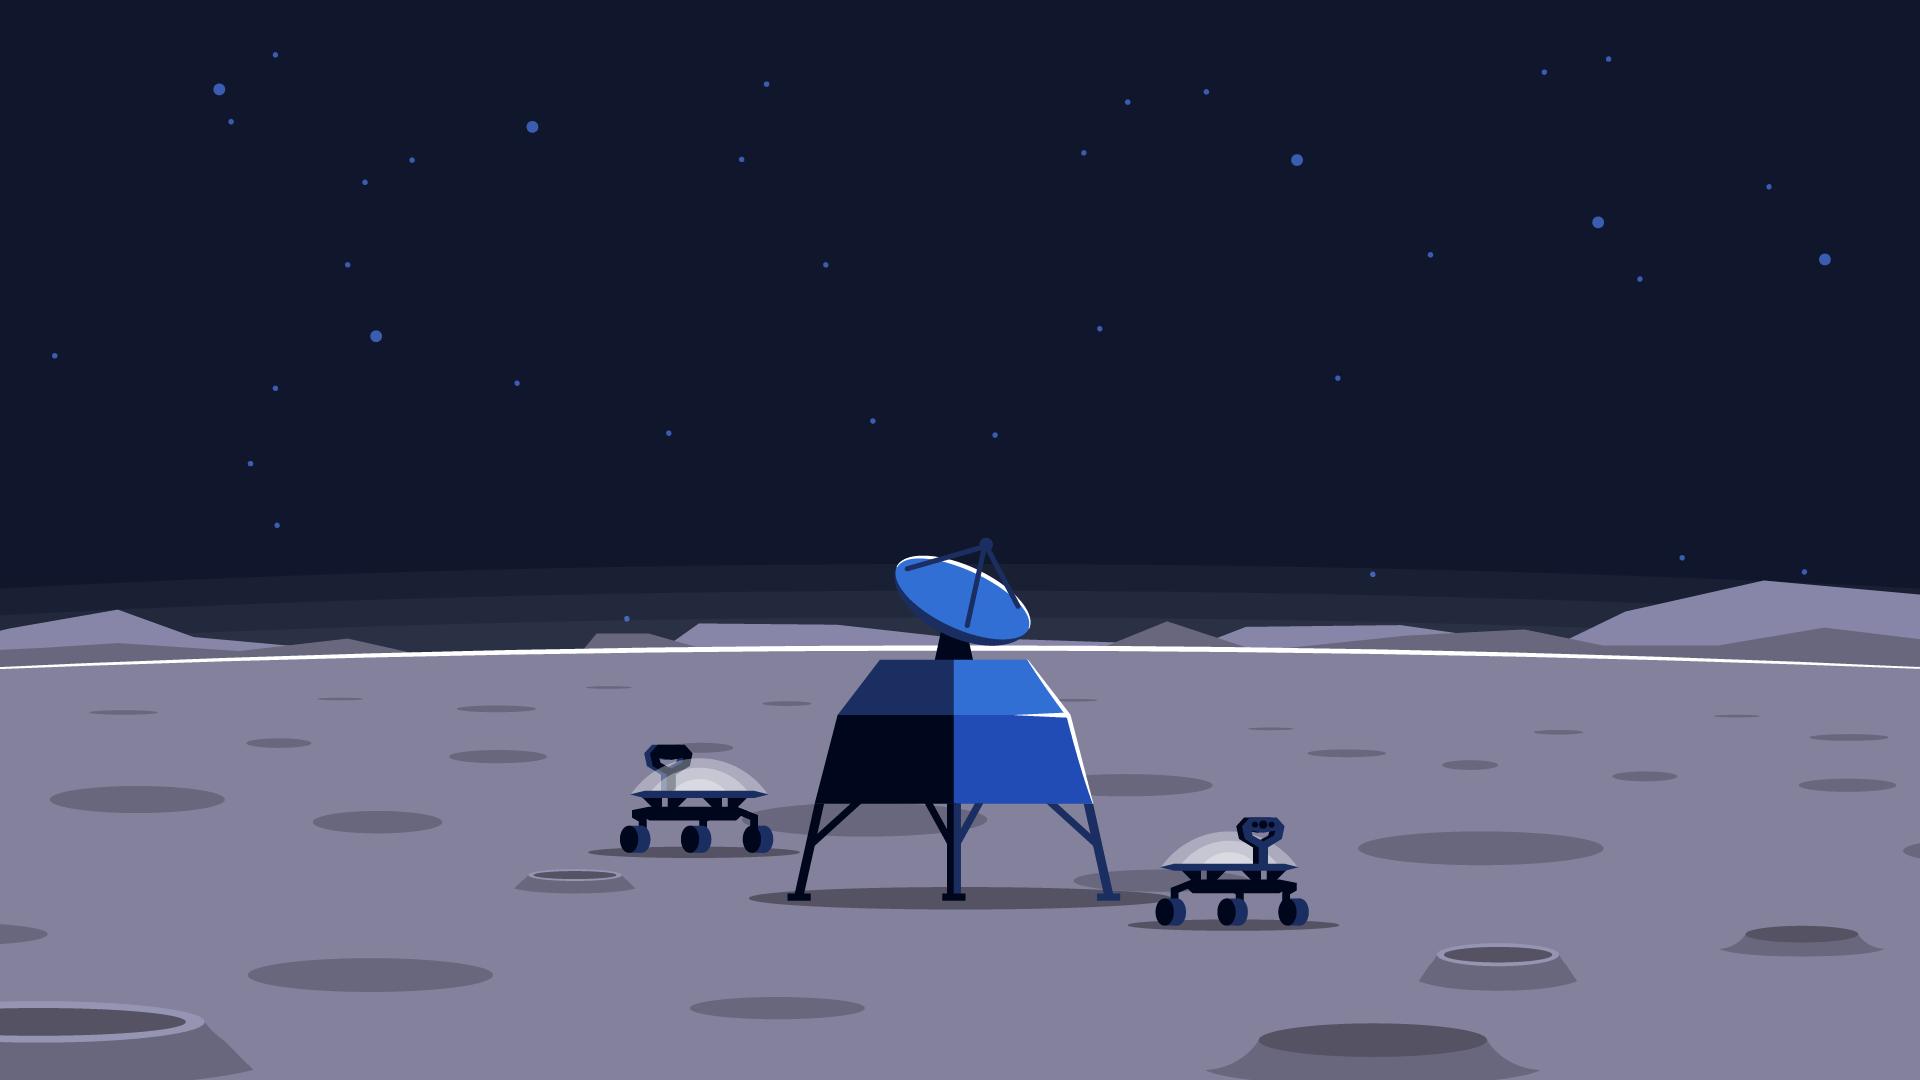 inanutshell-kurzgesagt-audi-mission-to-moon-01